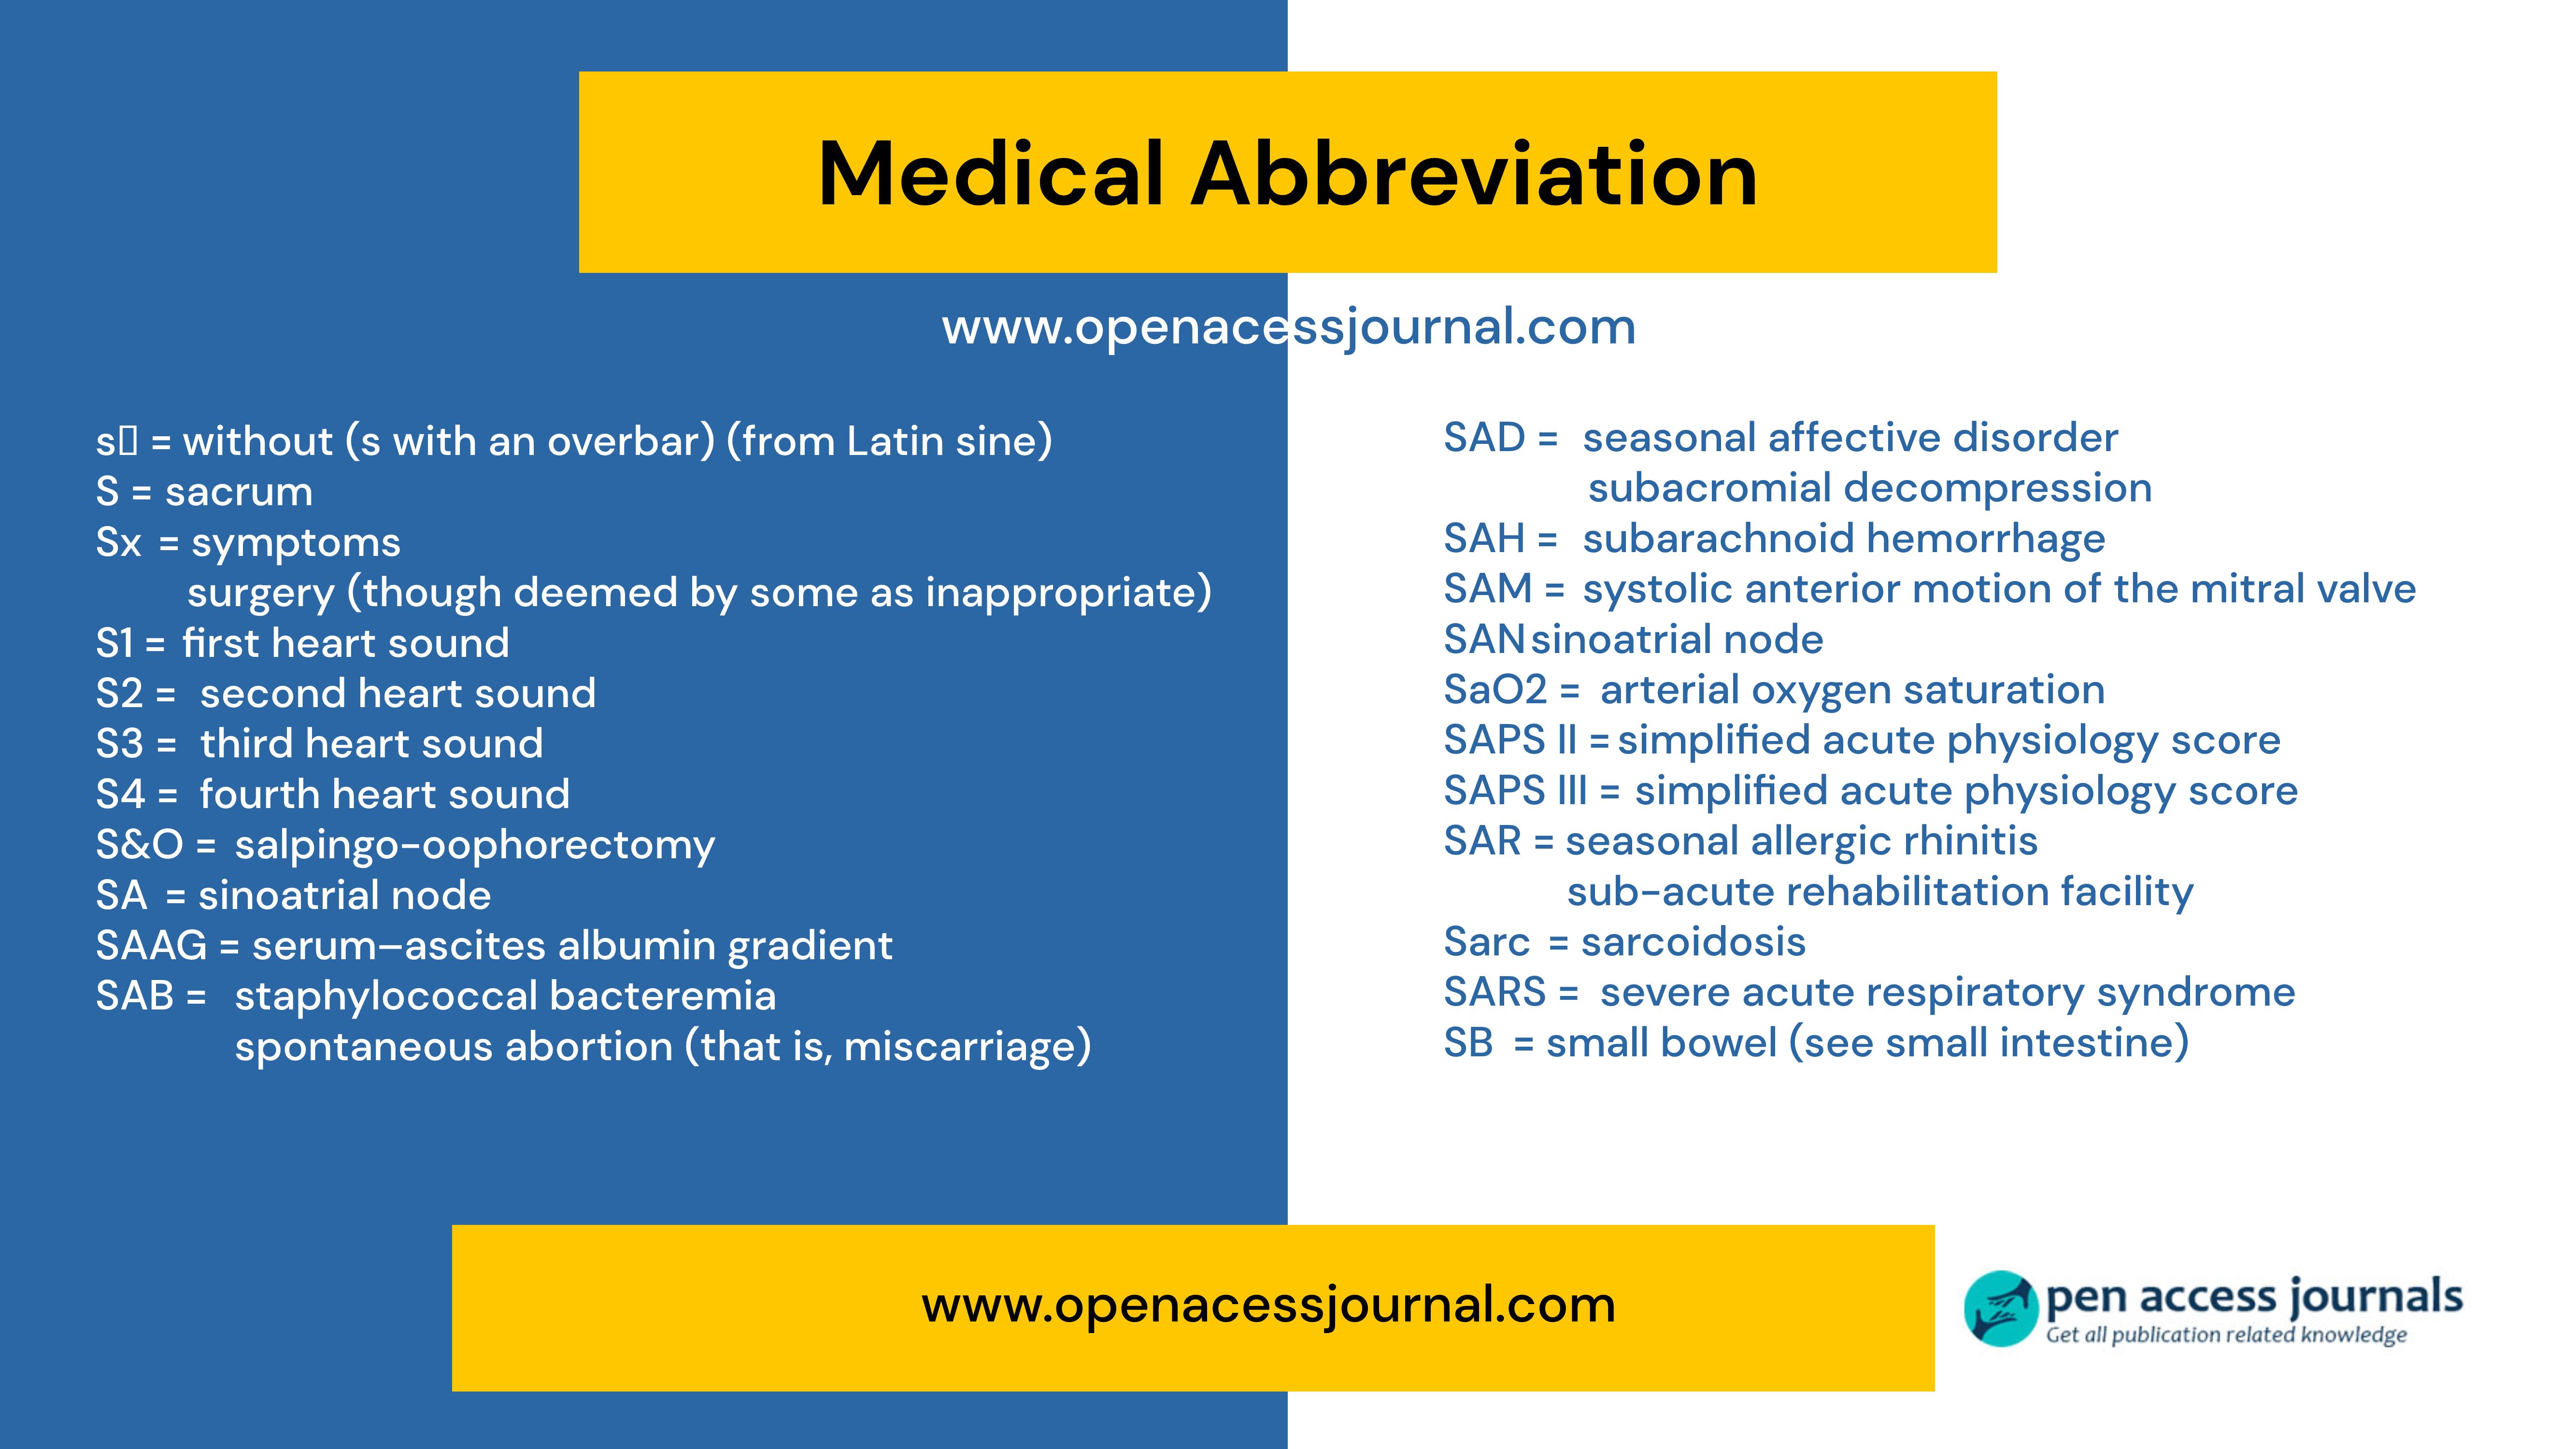 A-Z Medical abbreviation list